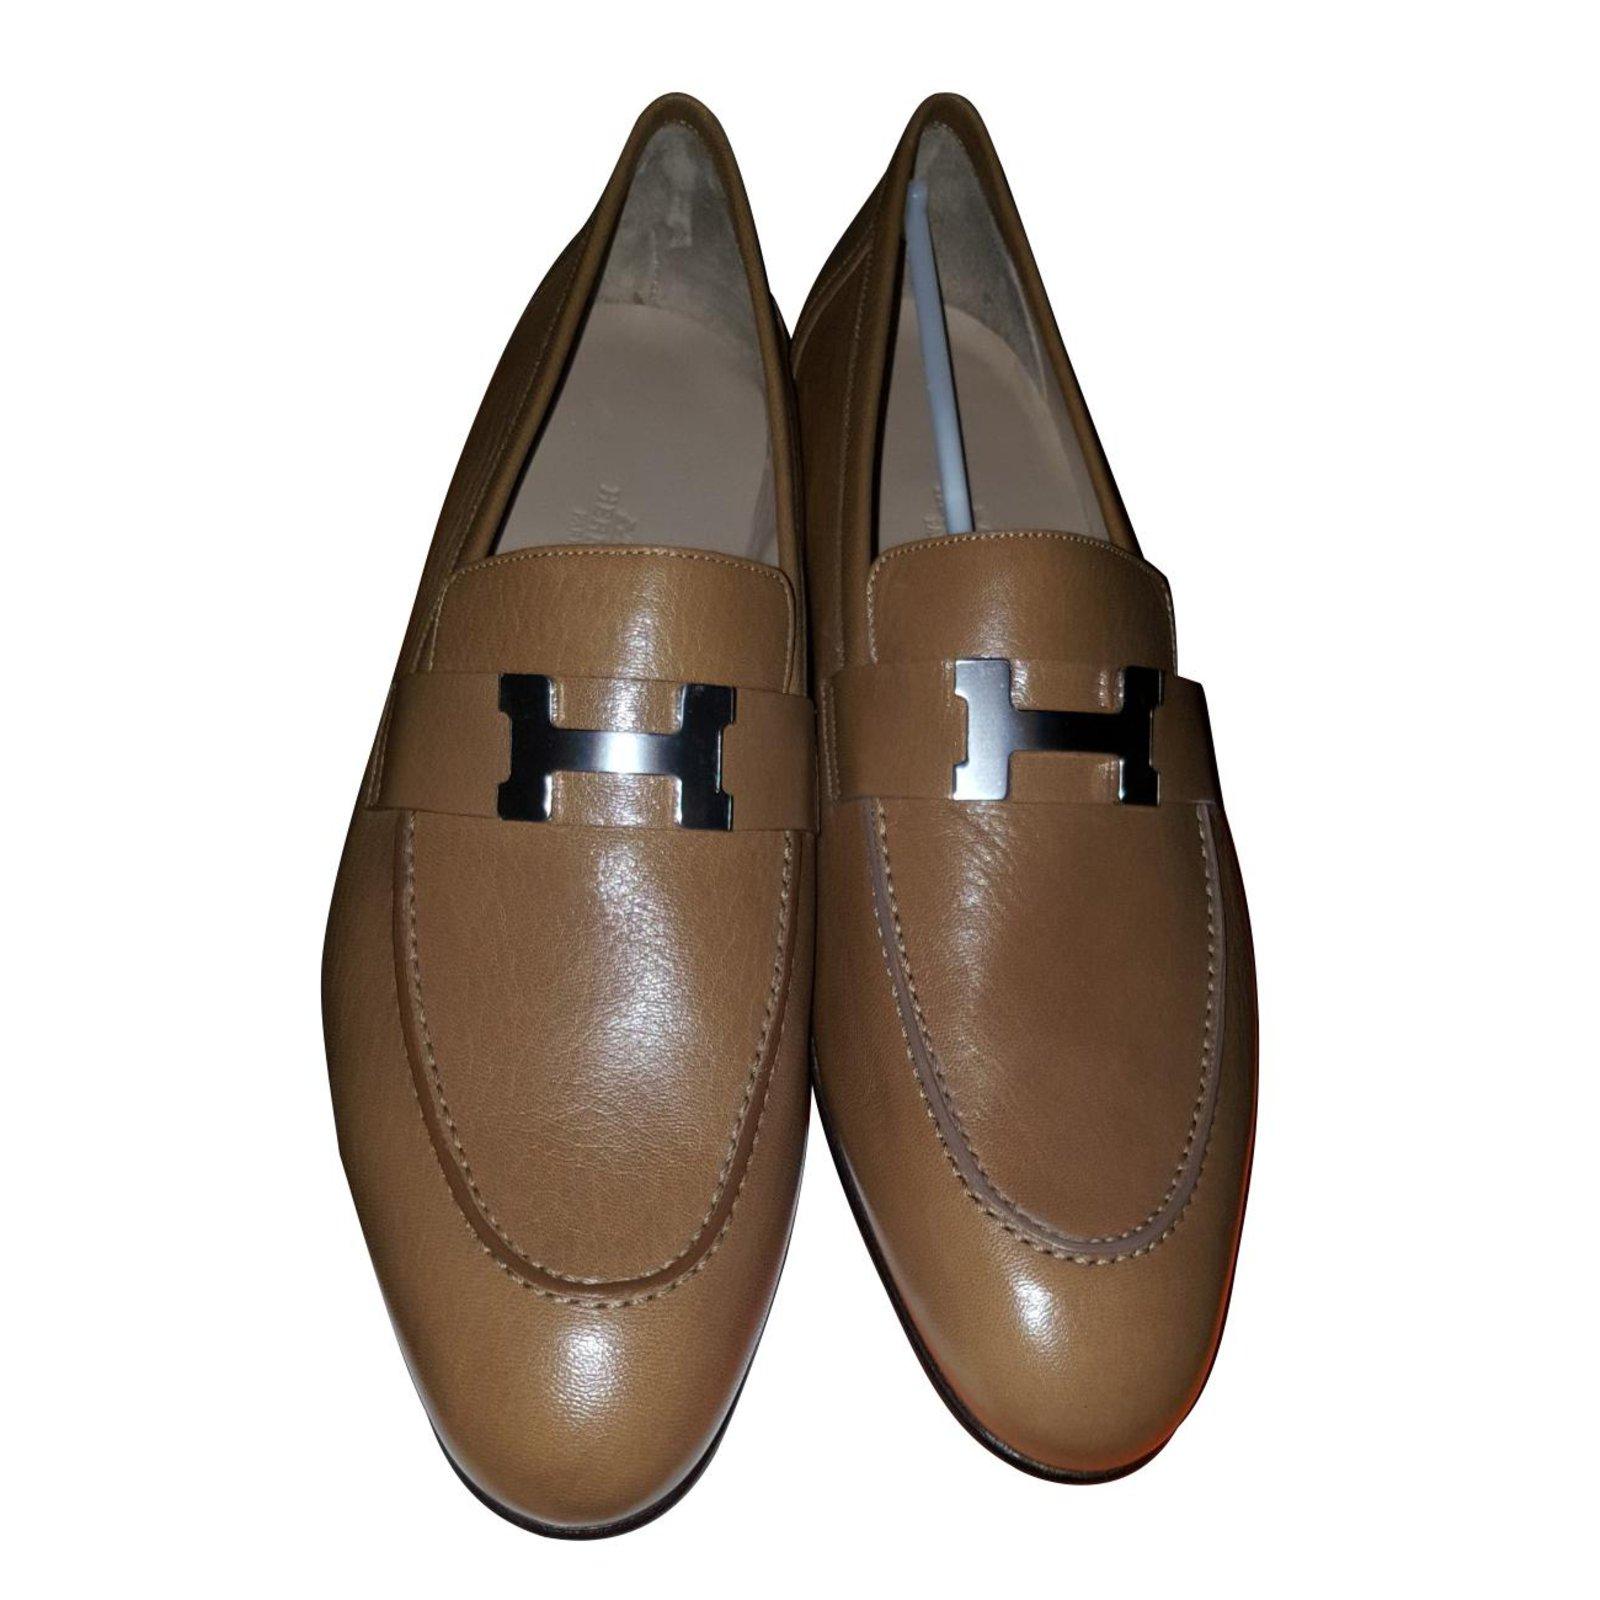 Hermès Paris Loafers Slip ons Leather